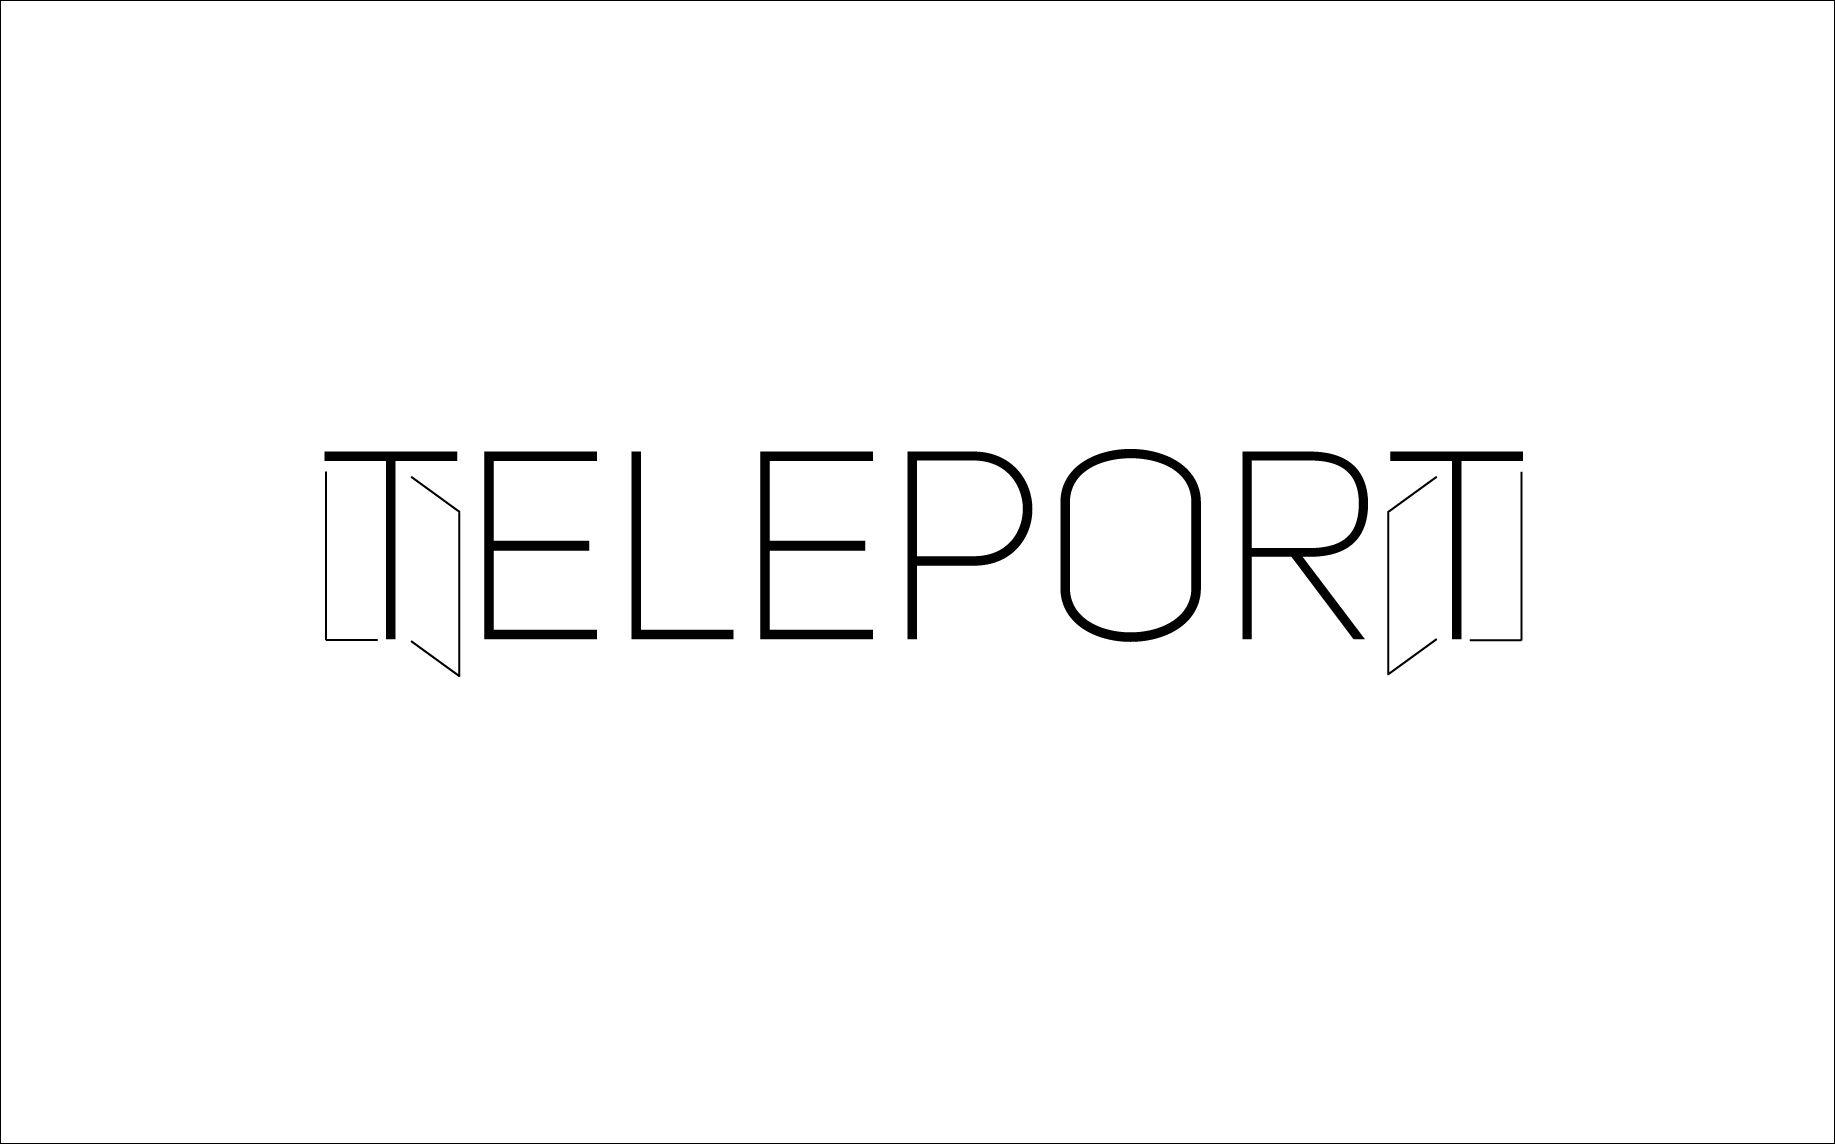 Логотип для Телепорт - дизайнер Gektor8